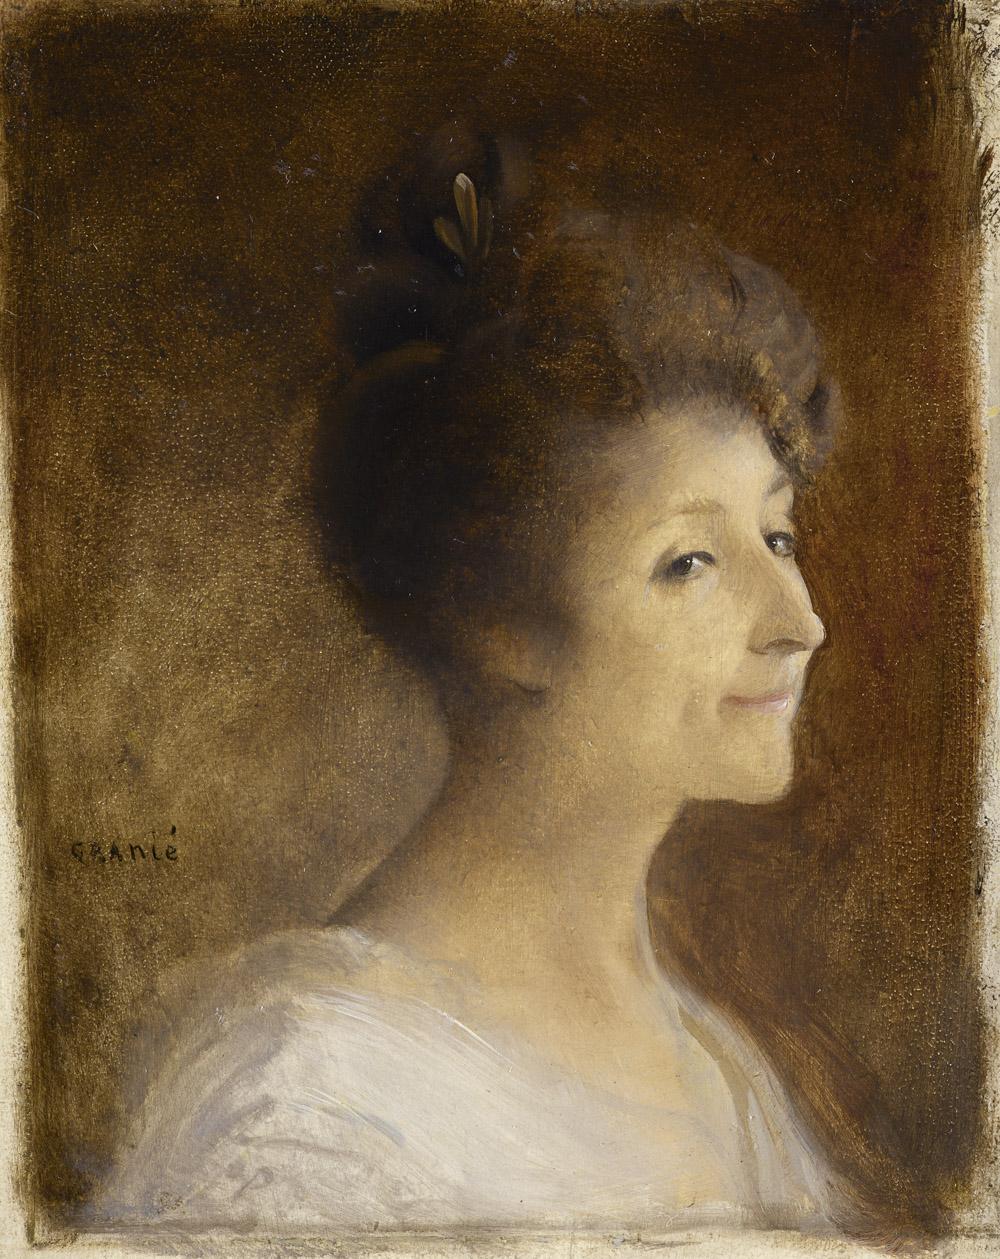 Jeune femme souriant, de profil